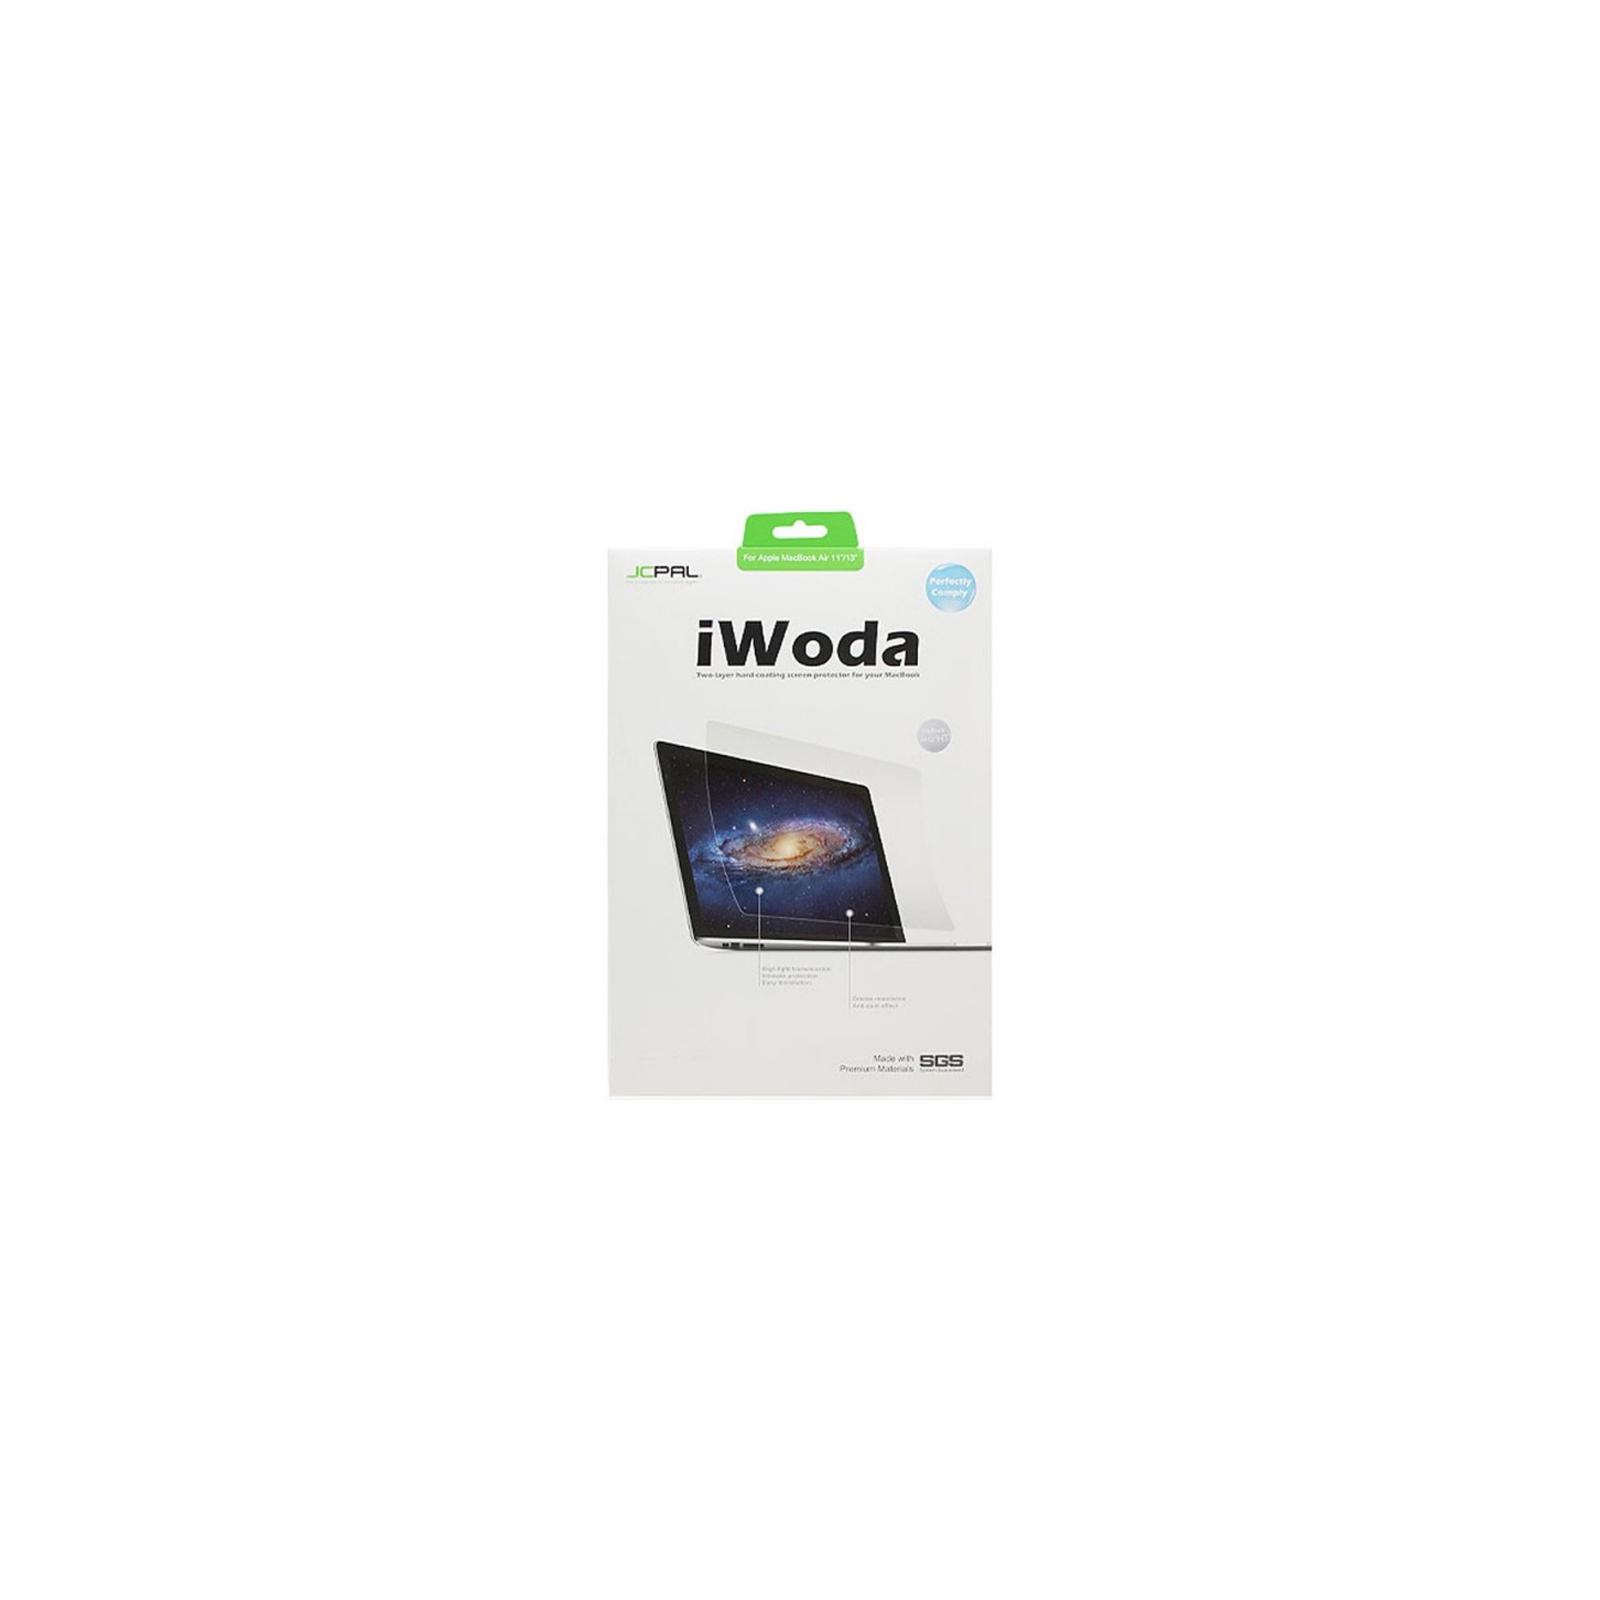 Пленка защитная JCPAL iWoda для MacBook Pro 13 (High Transparency) (JCP2011)